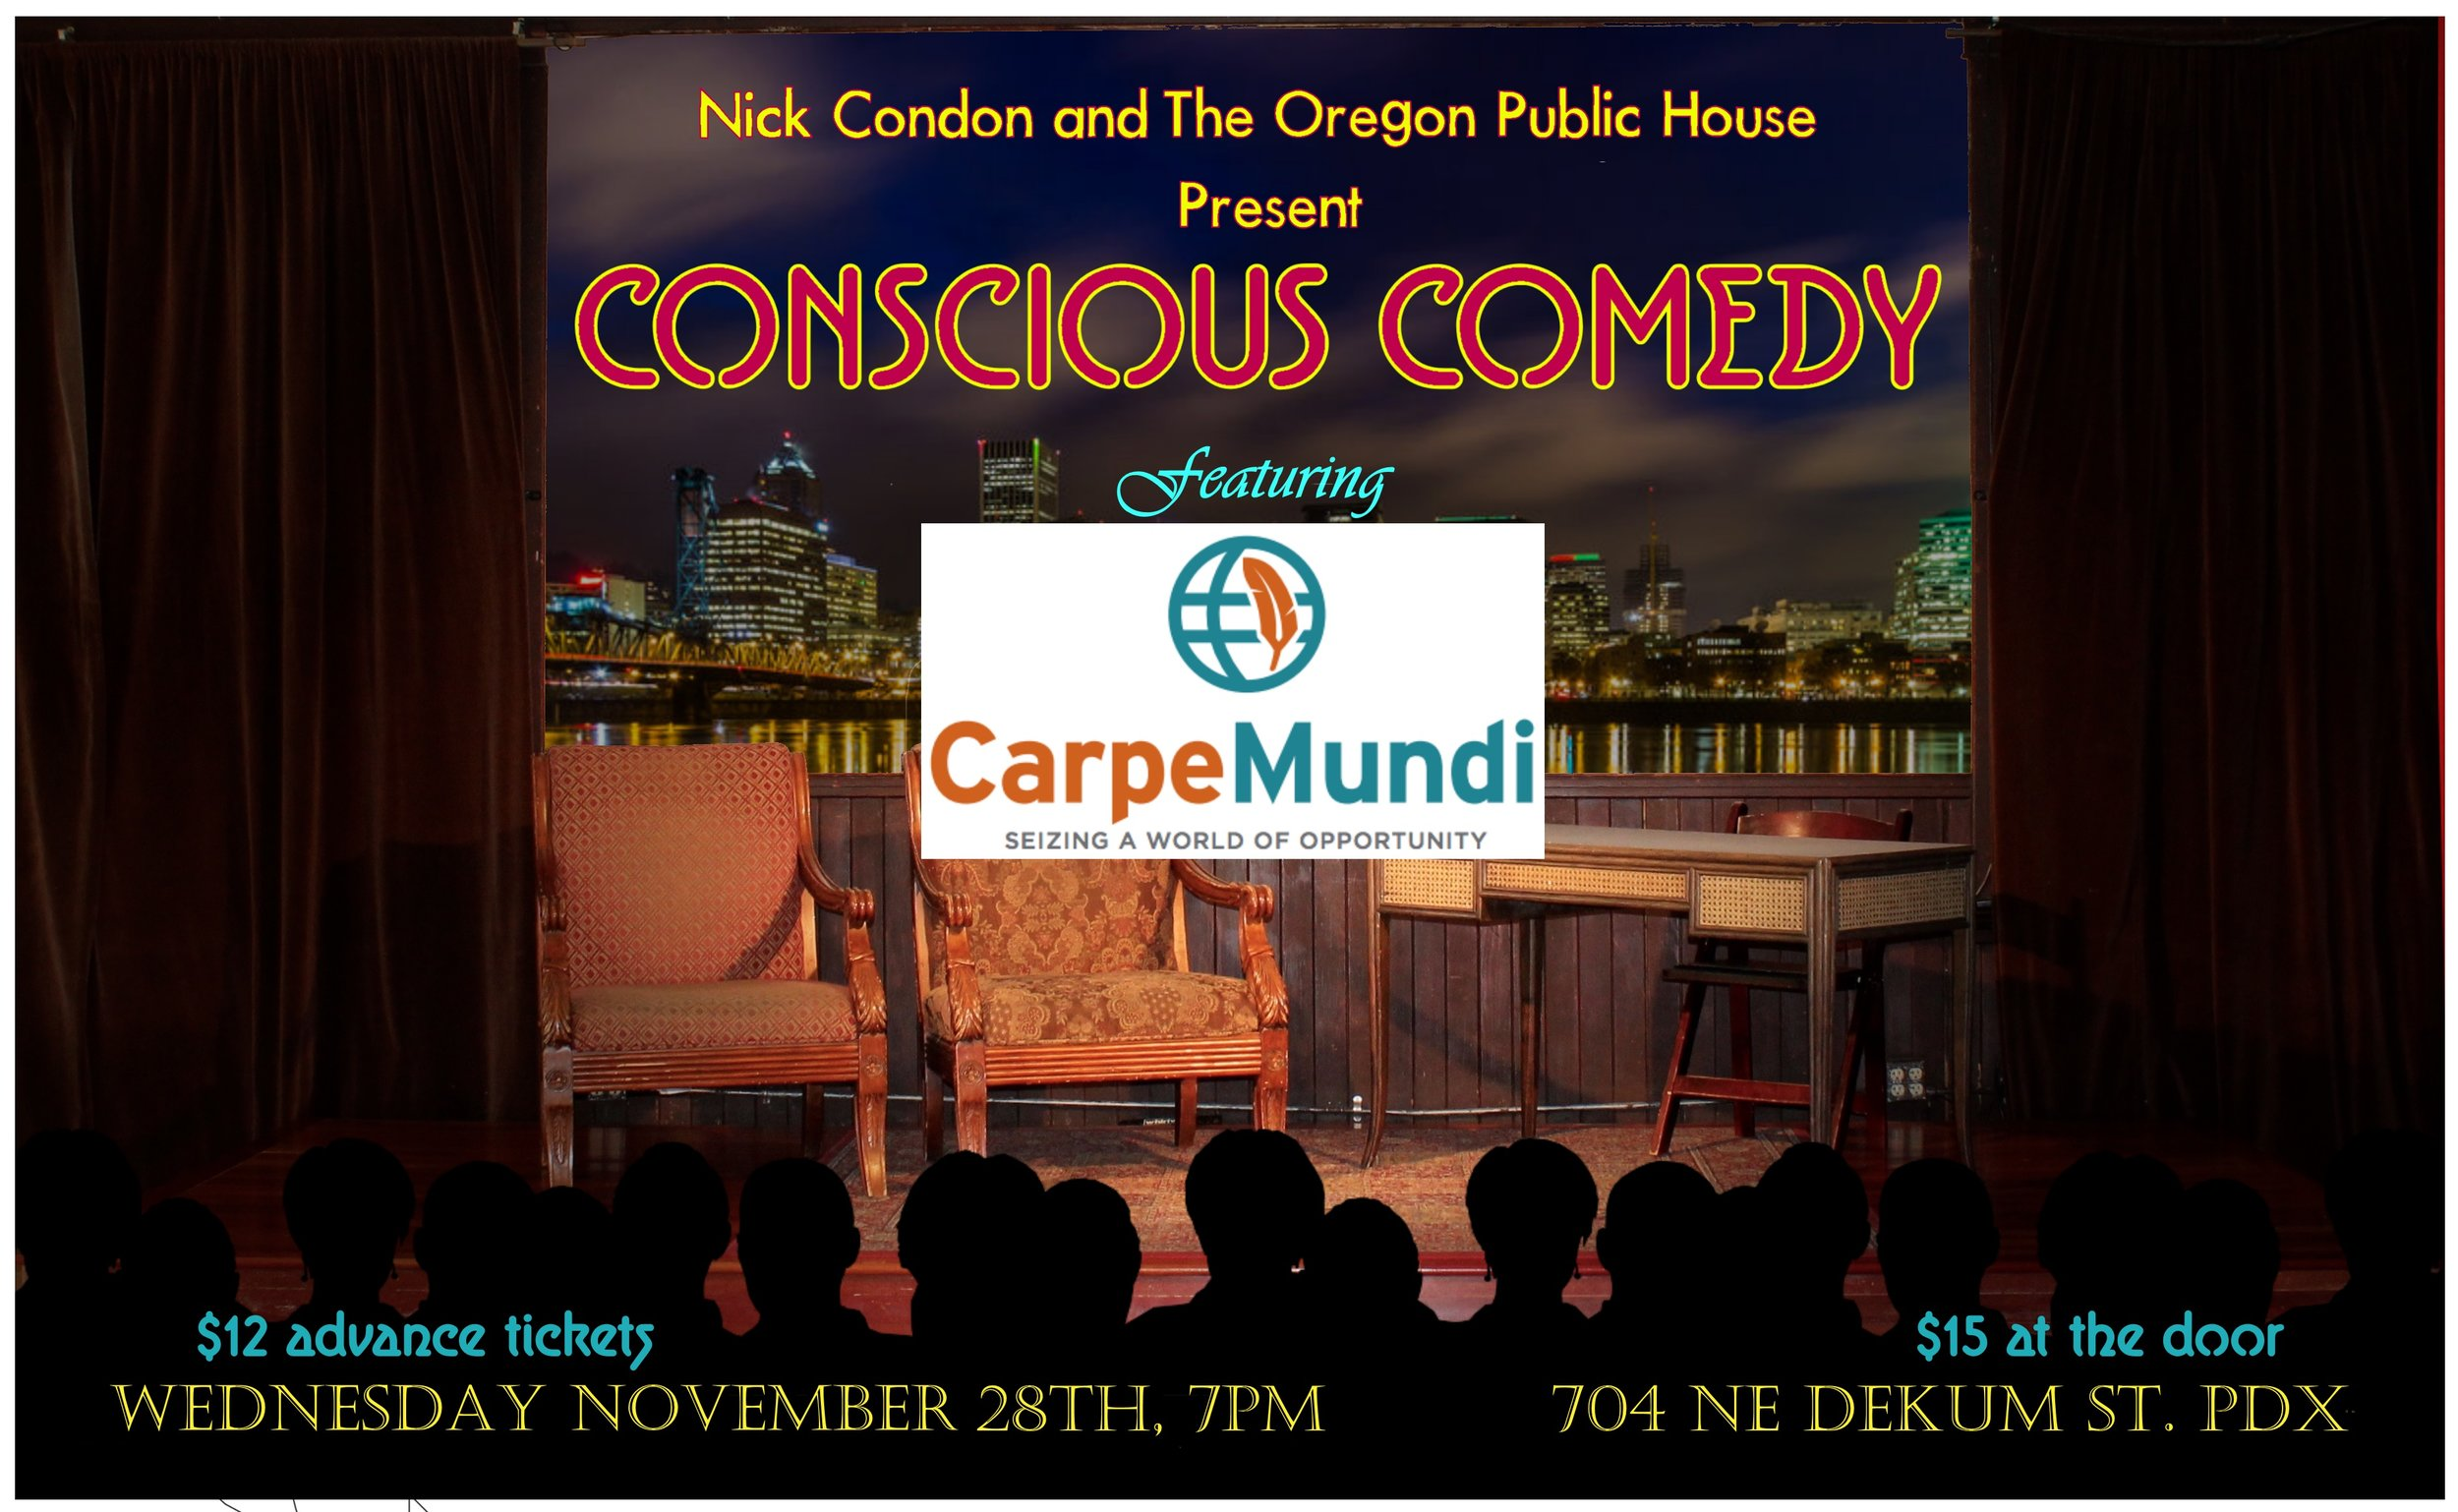 Conscious Comedy Carpe Mundi (1).jpg